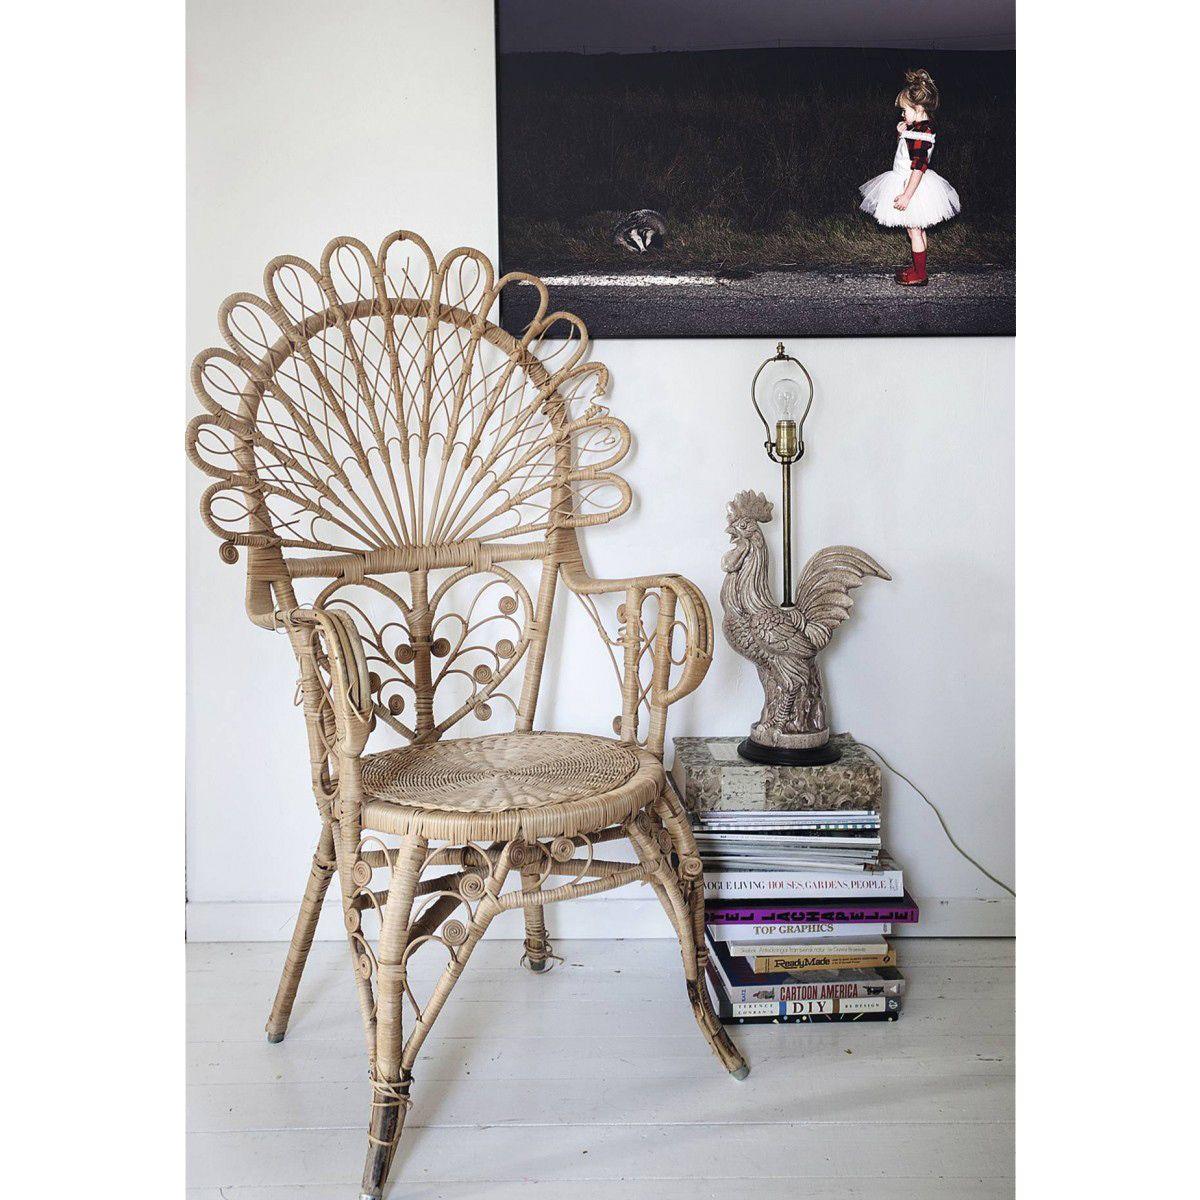 Teneues A Beautiful Mess English Version Hardcover Book In 2020 Wicker Decor Wicker Furniture Wicker Chair